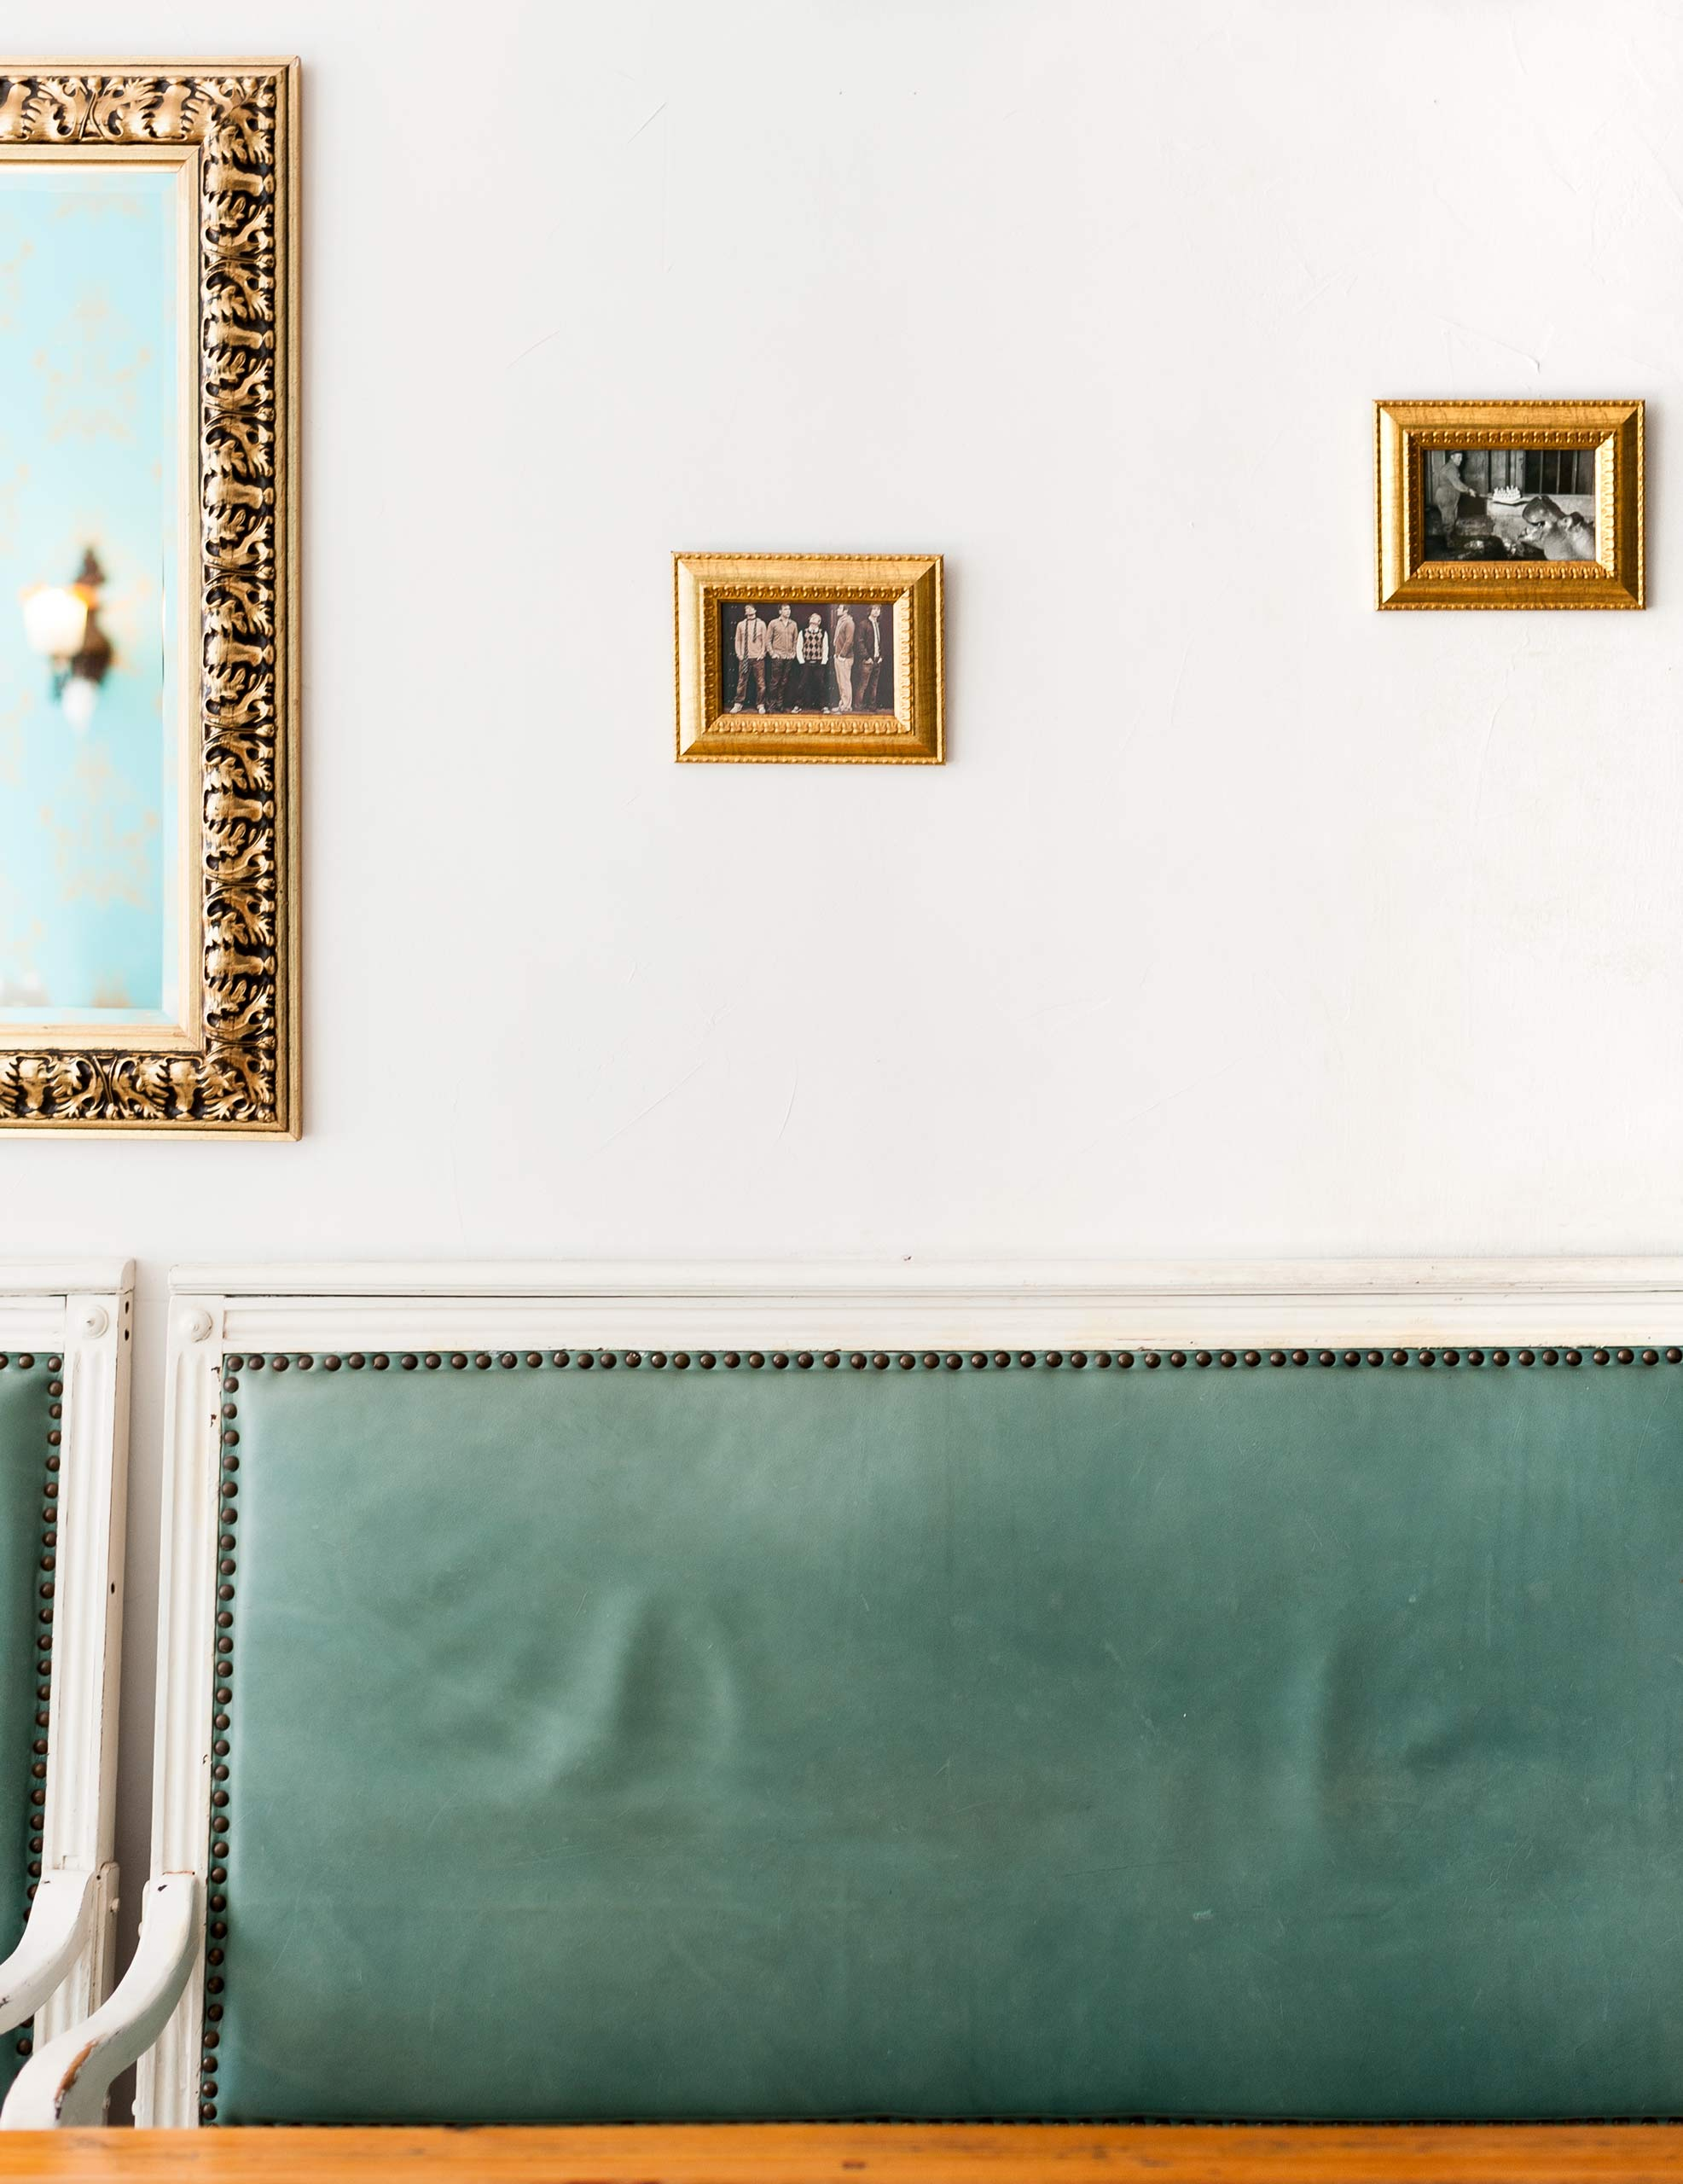 Interieurfotografie - Gretchens Villa, Hamburg